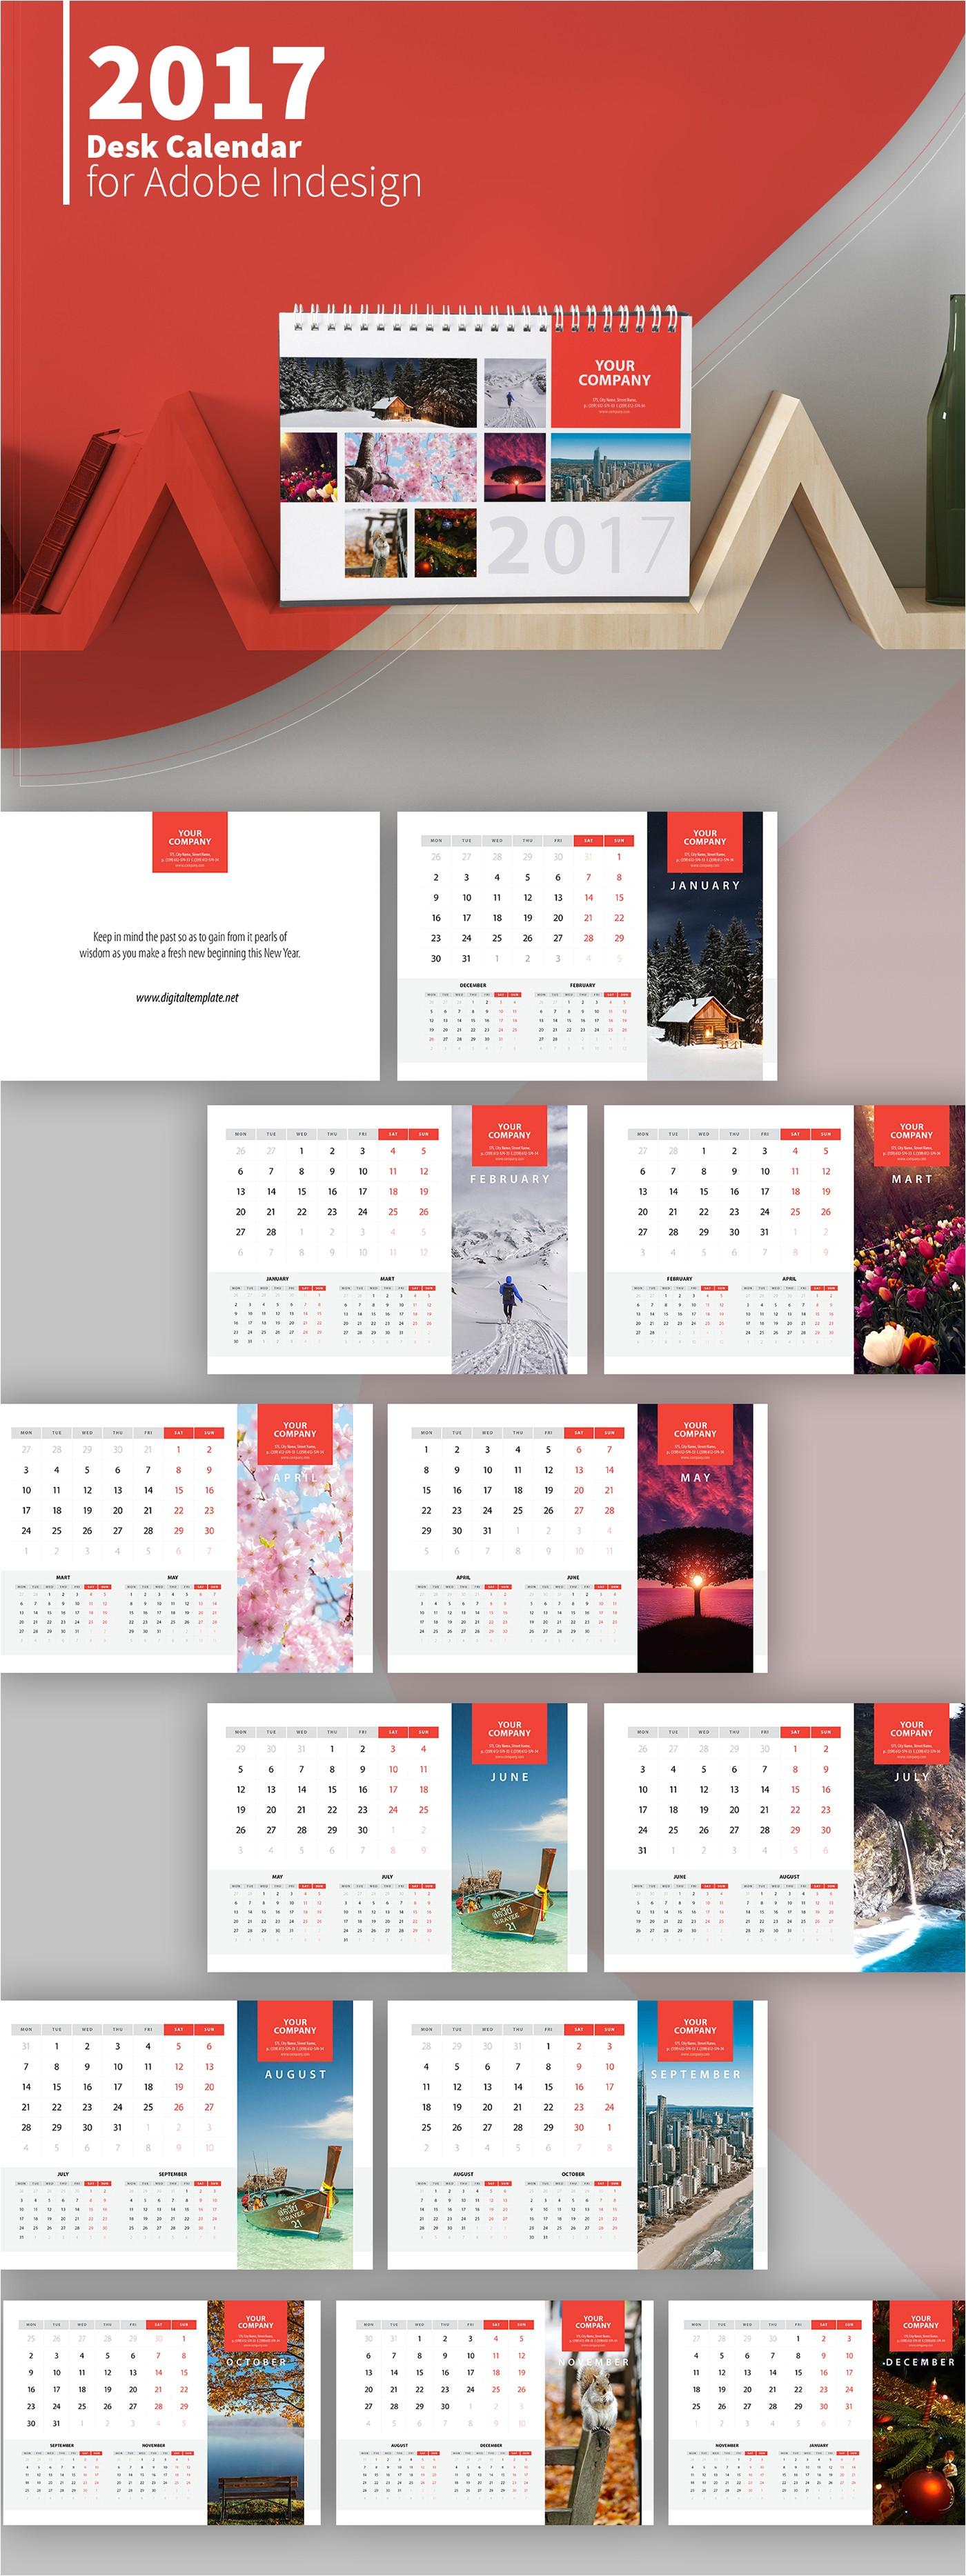 Adobe Photoshop Calendar Template Freebie 2017 Desk Calendar Template On Behance